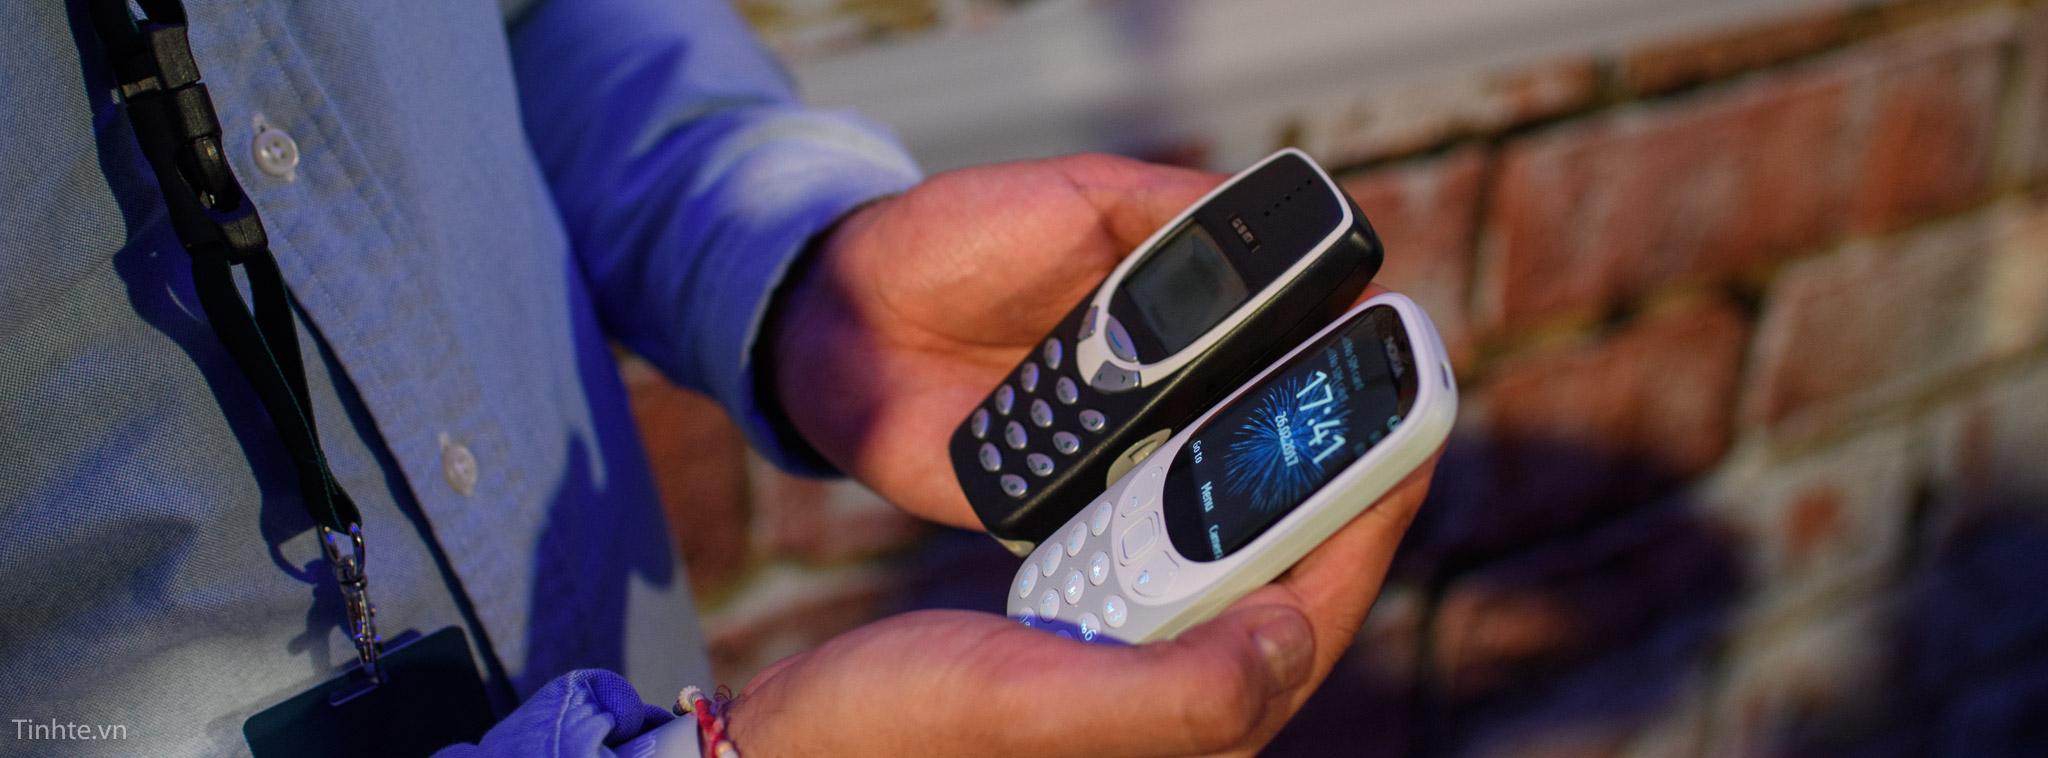 Nokia3310-5.jpg